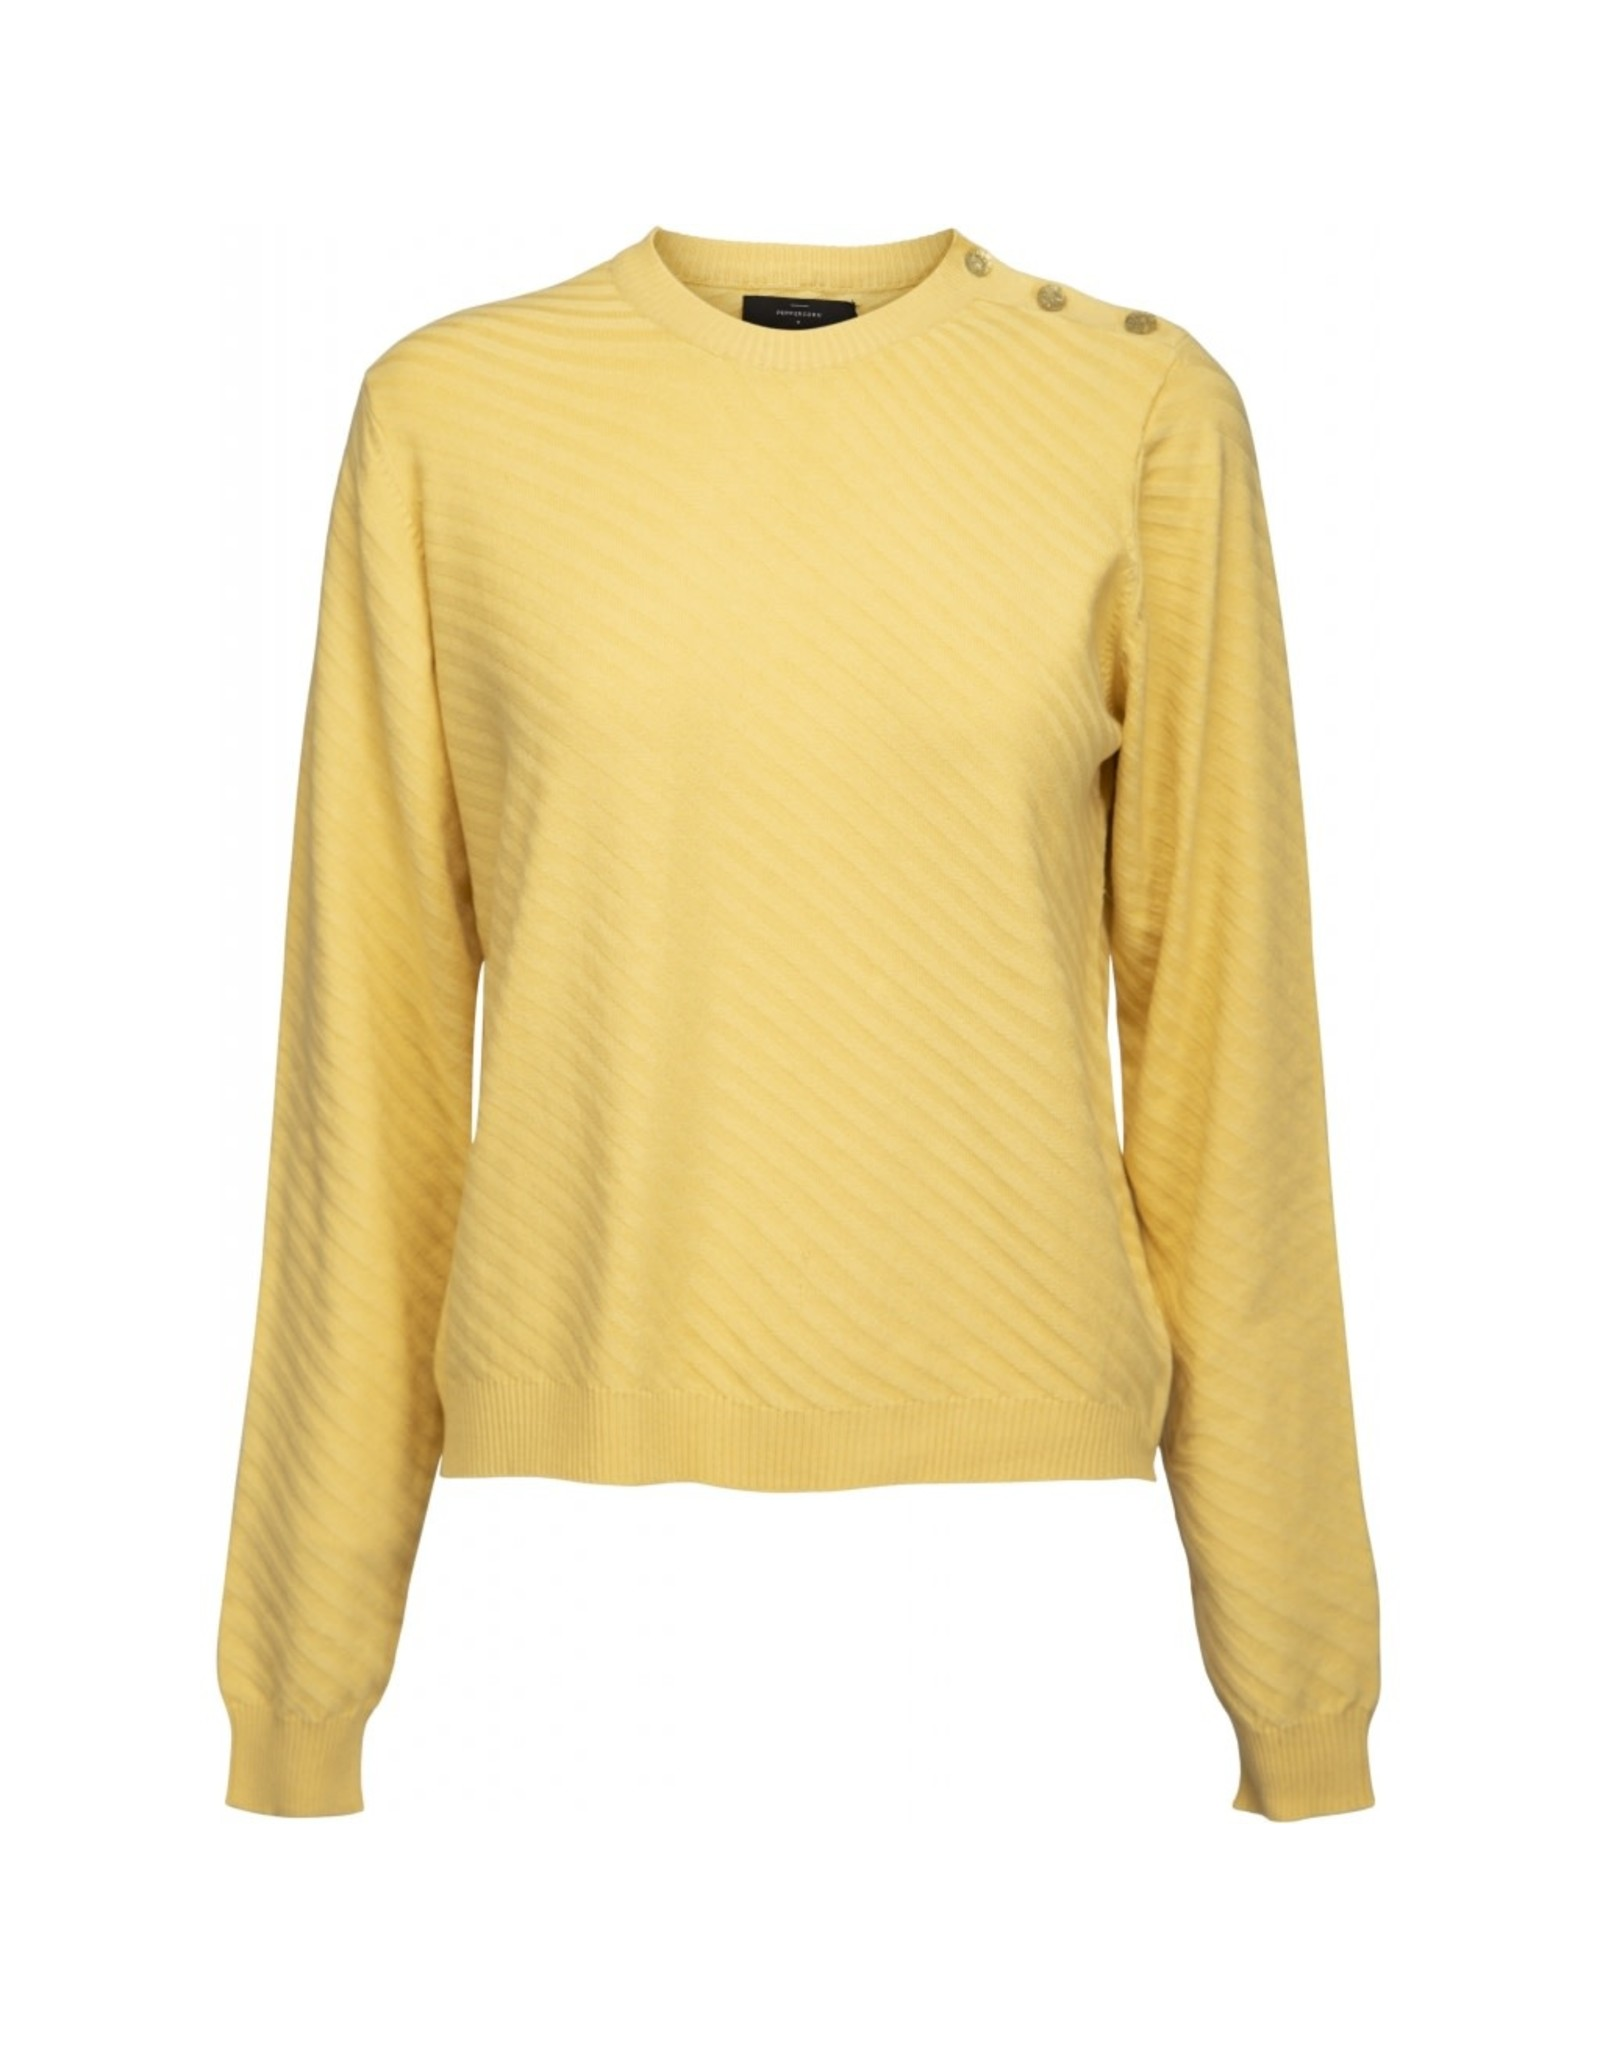 Knit Natasha Yellow